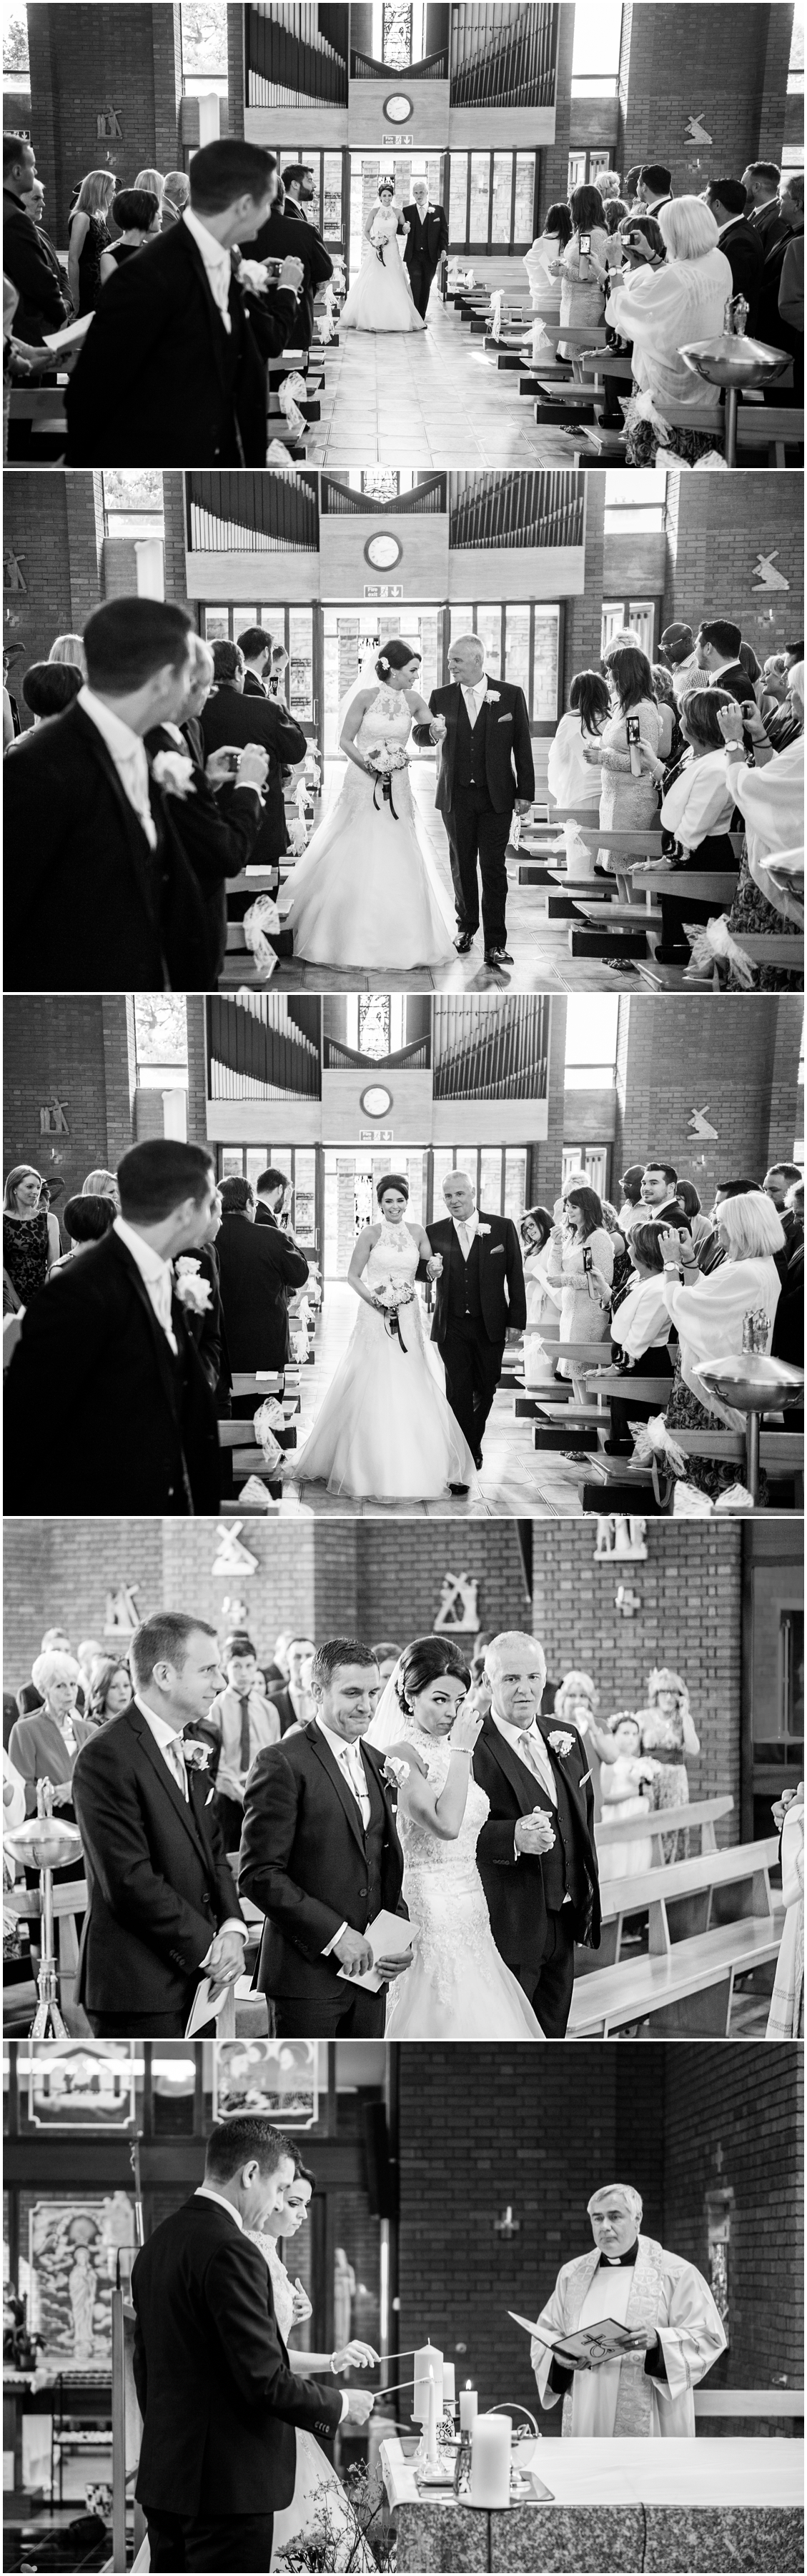 Moxhull Hall Wedding Photography, Sutton Coldfield, Lisa Carpenter Photography, photos